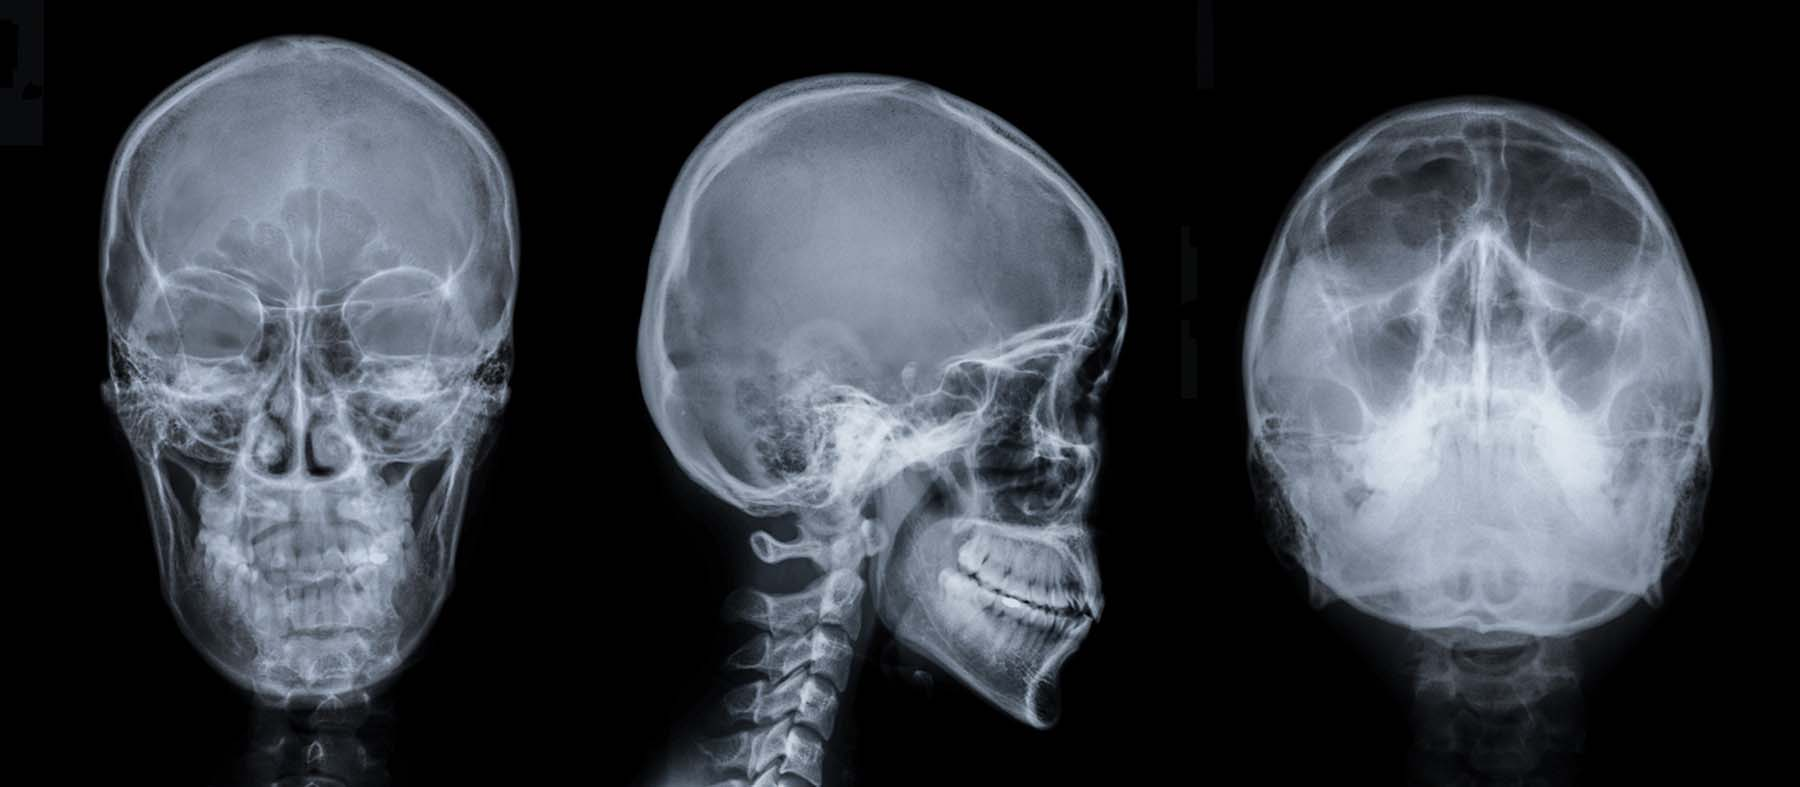 X Ray Procare Radiology